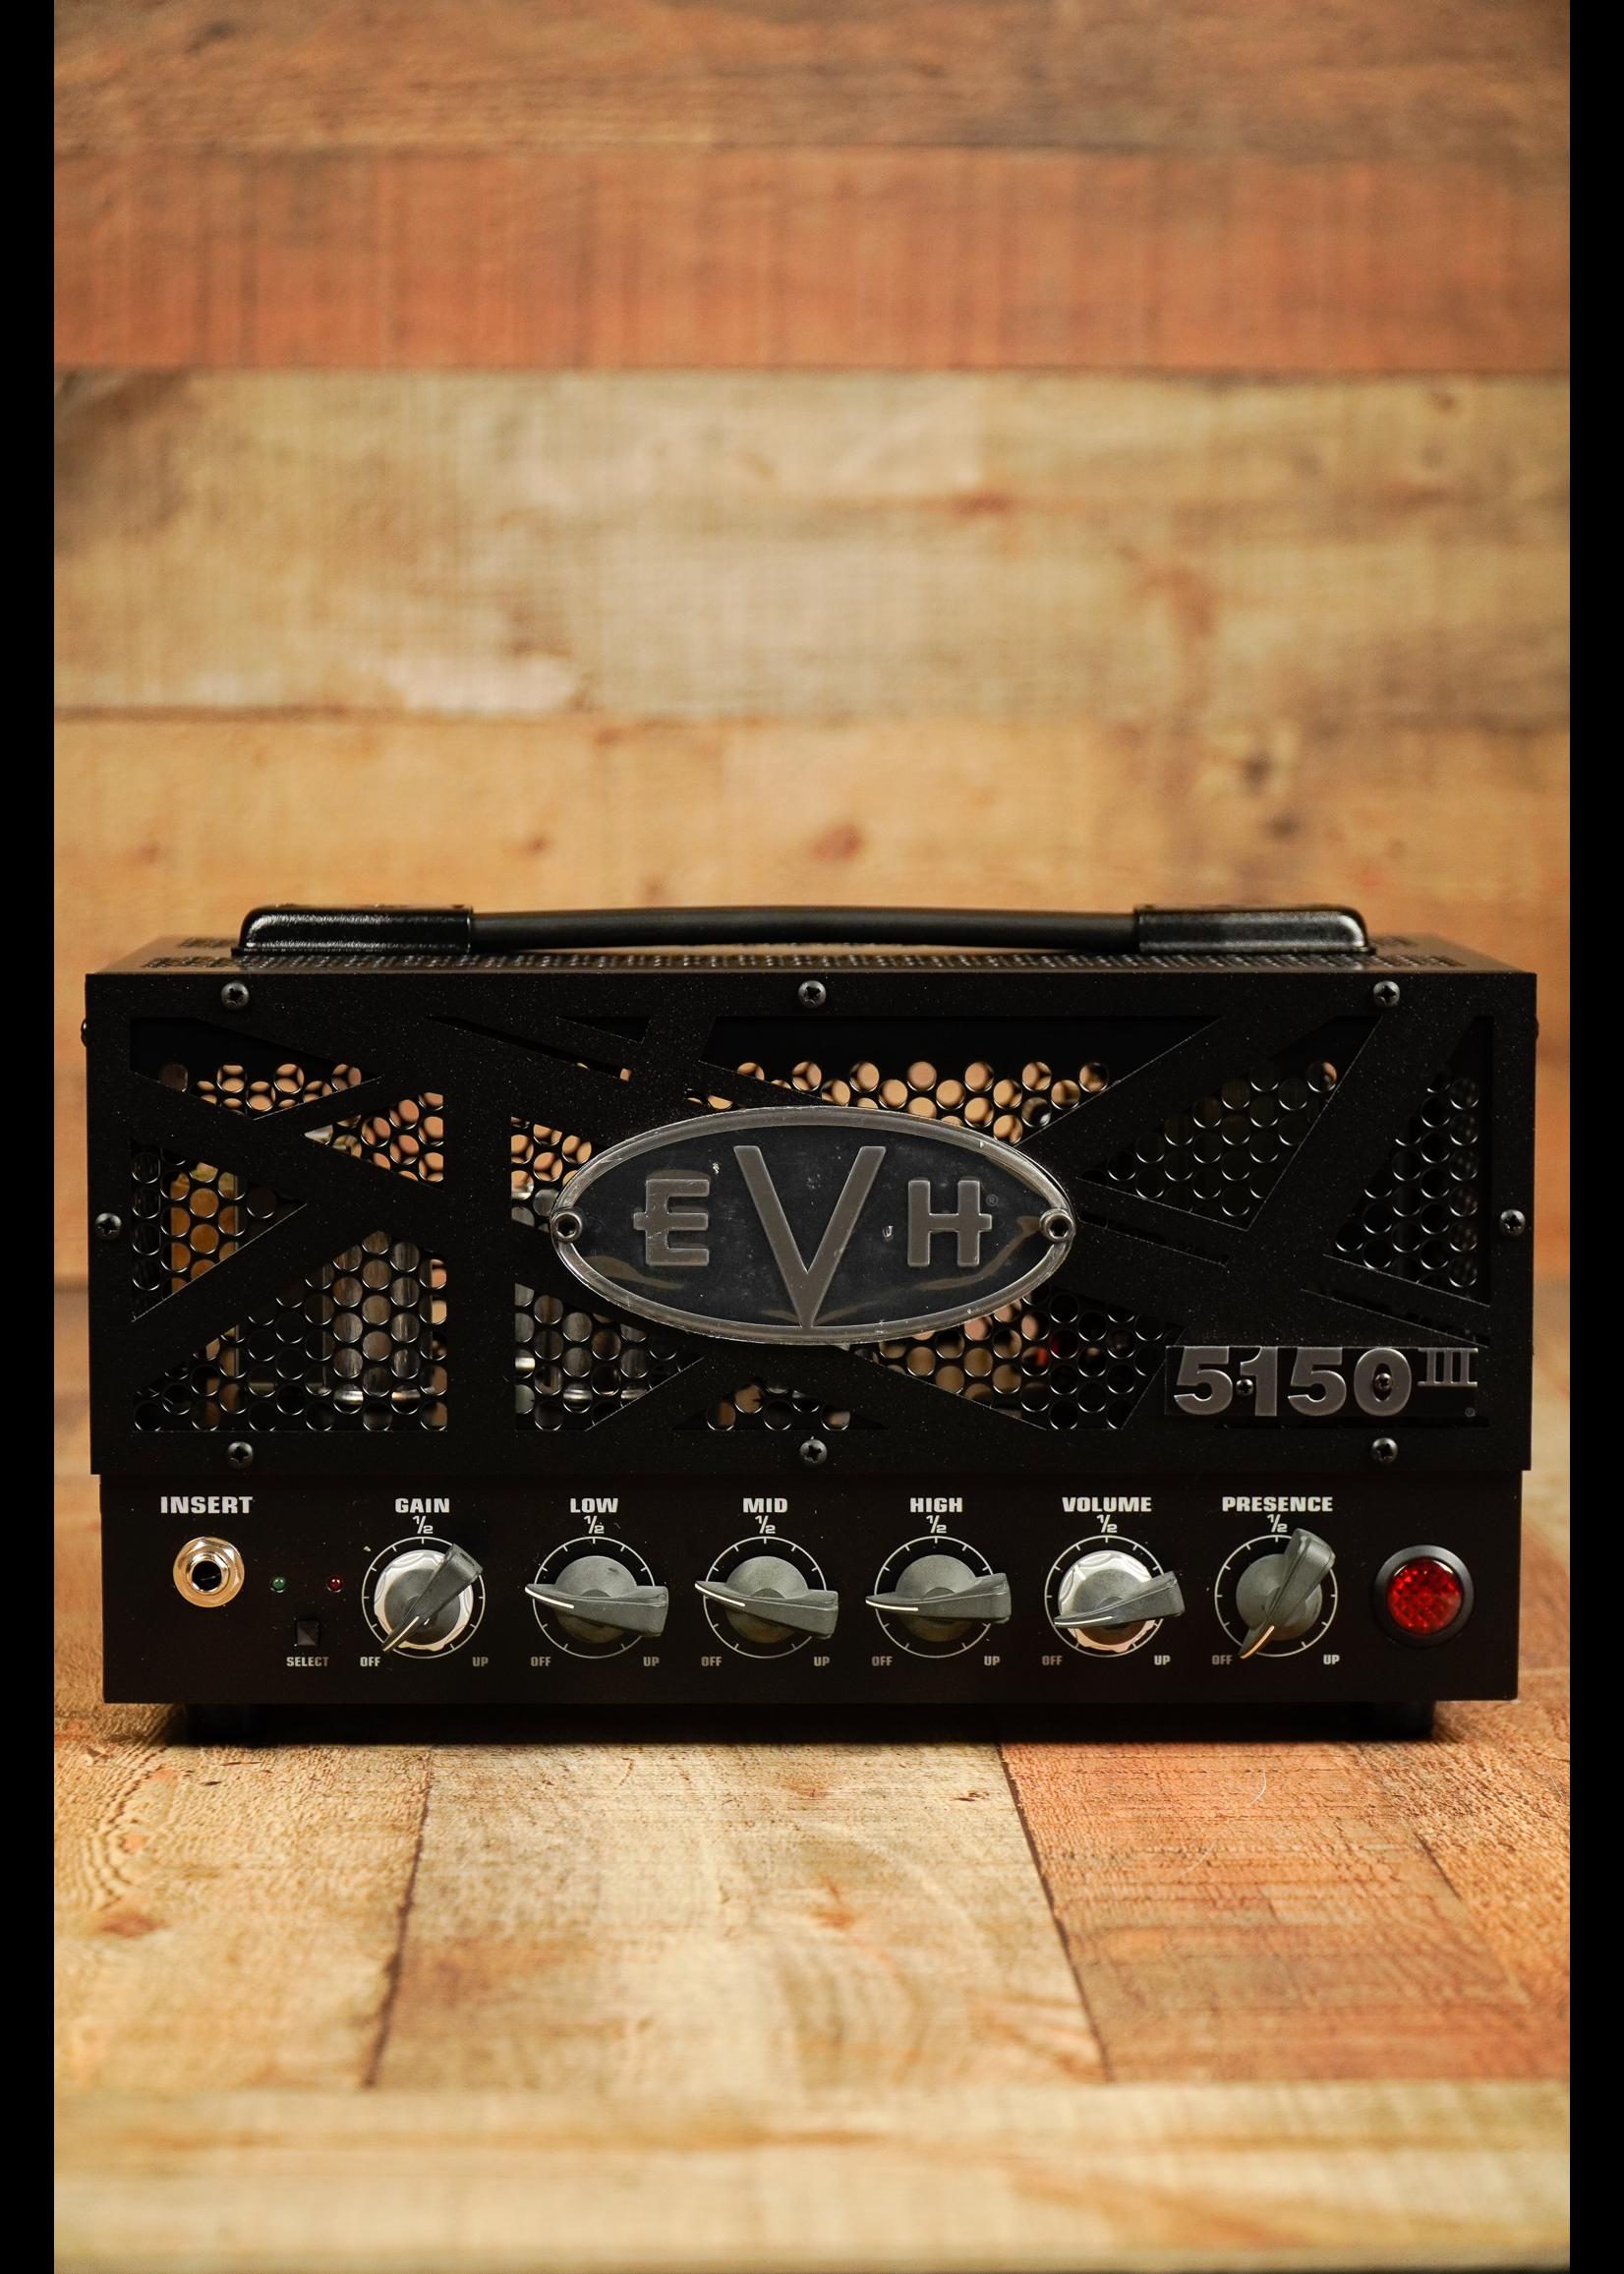 EVH EVH 5150III® 15W LBX-S Head, Black